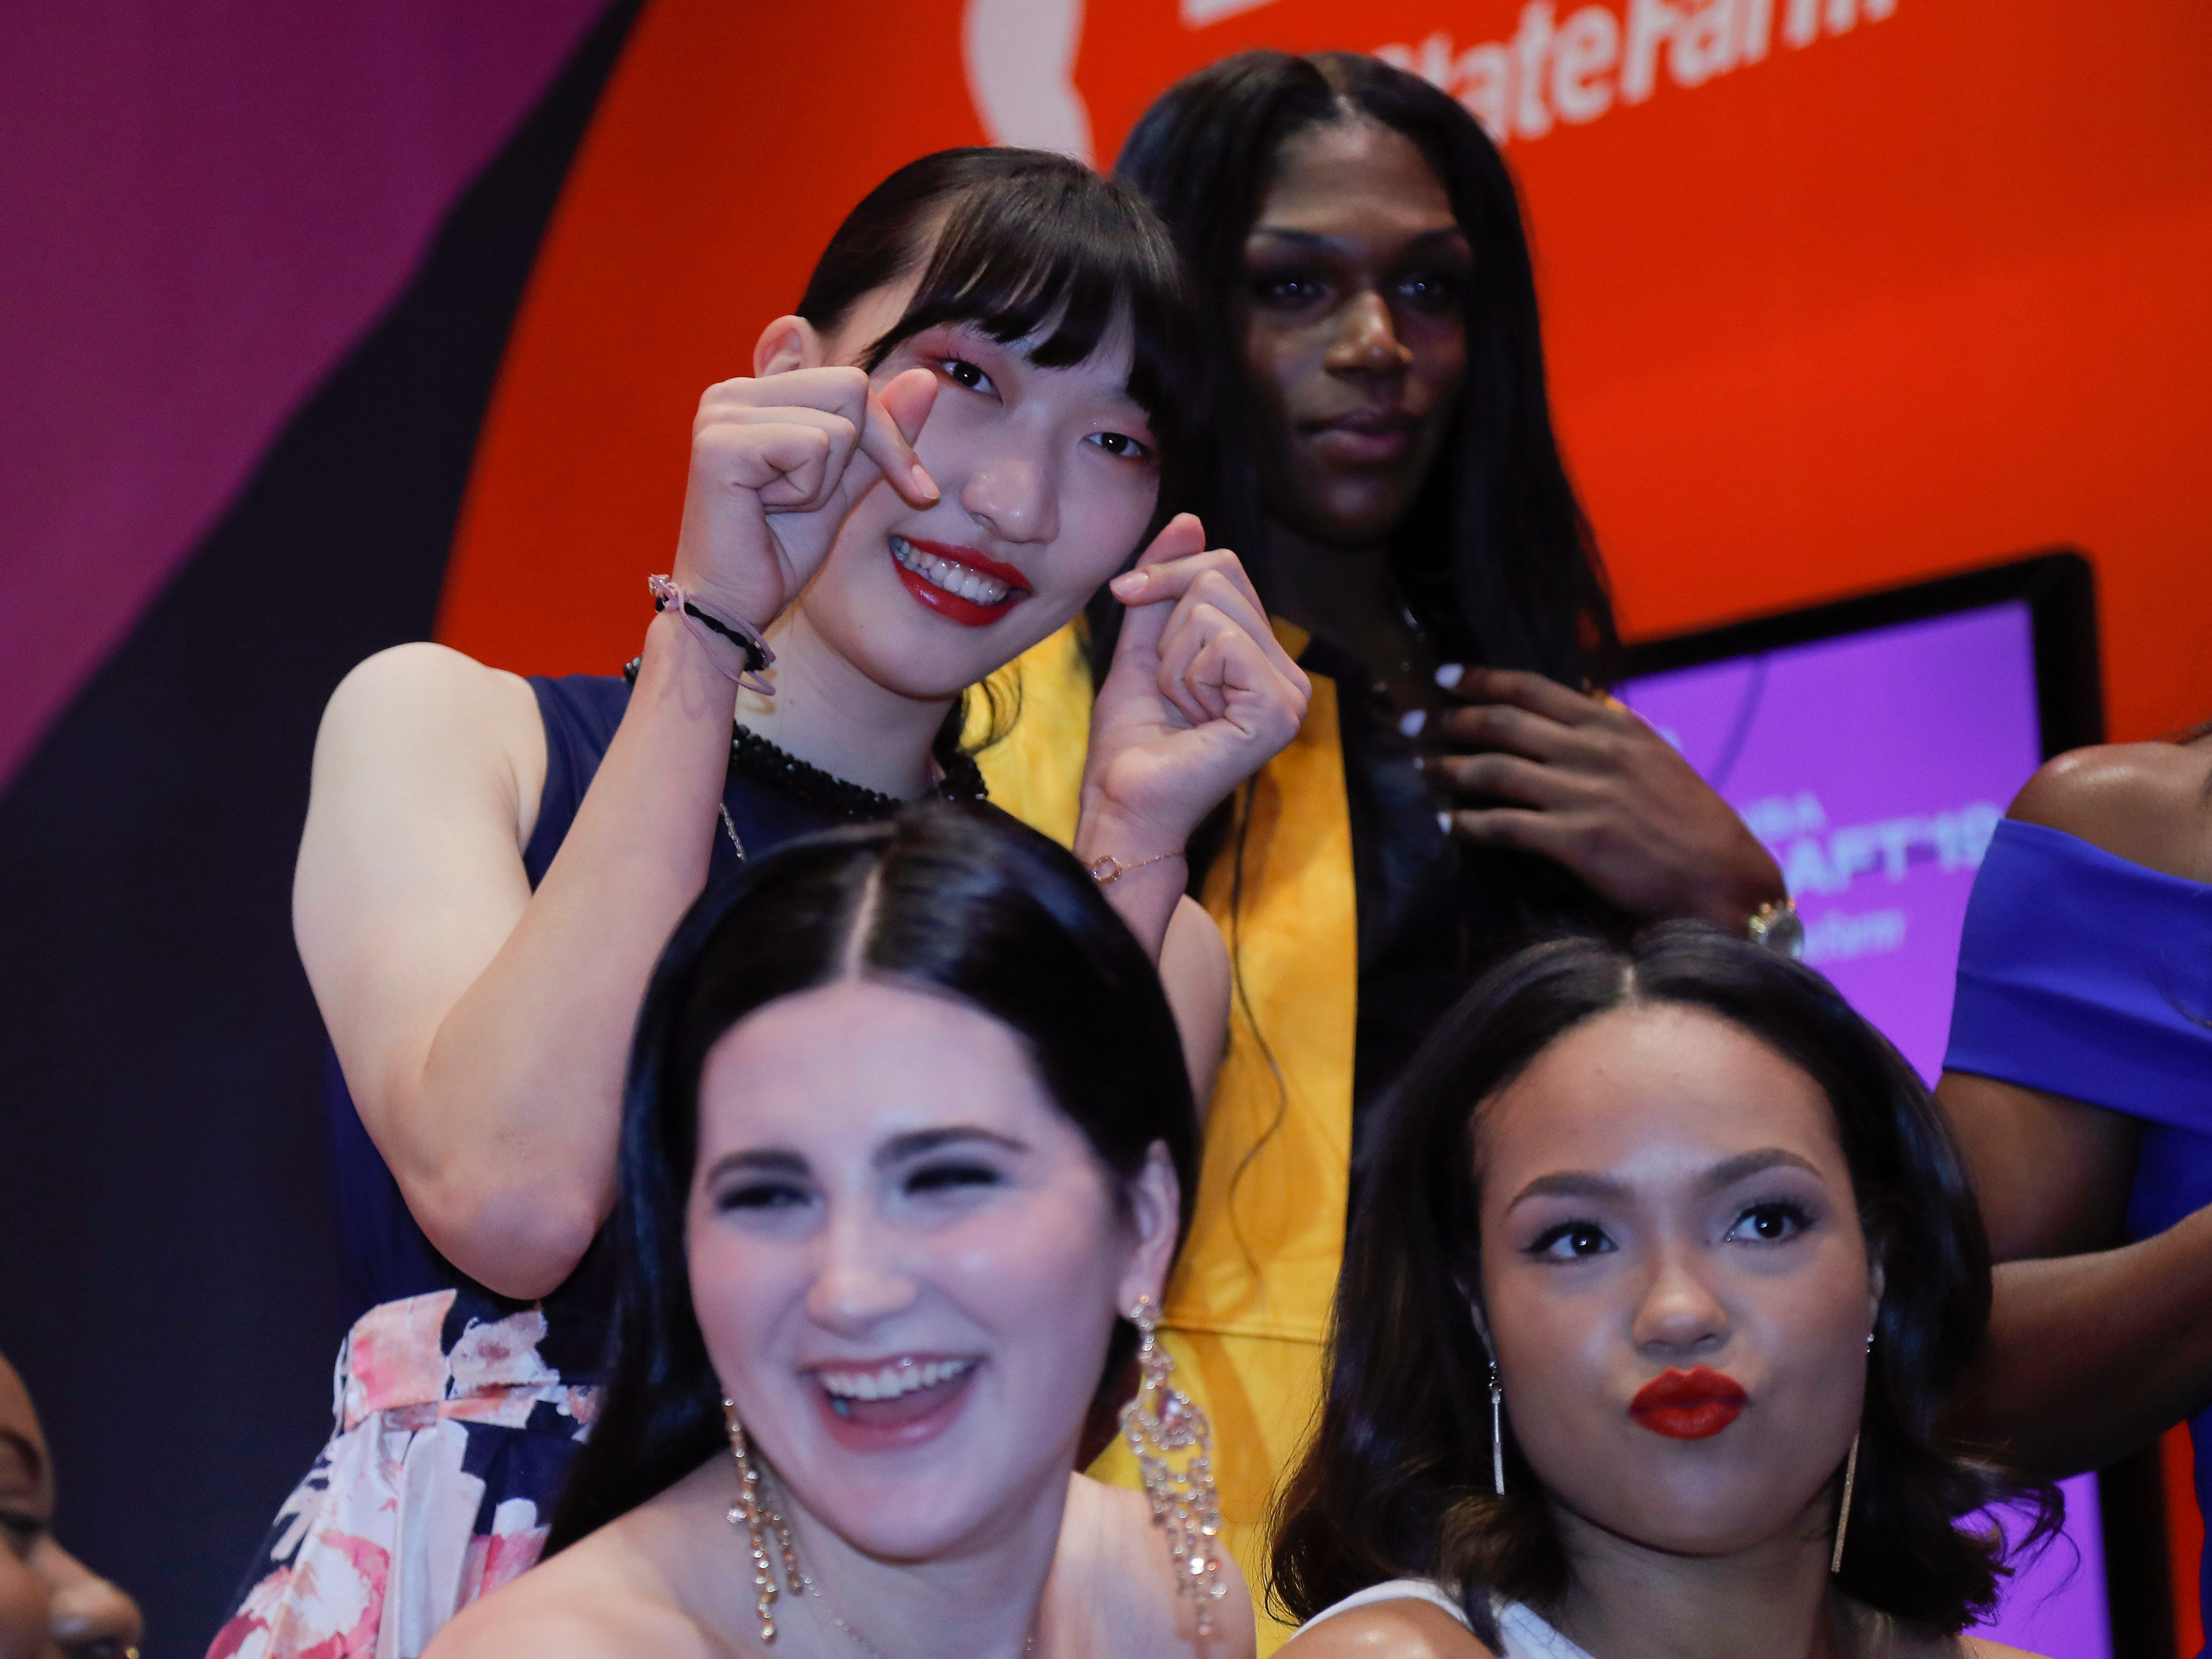 Han Xu, Teaira McCowan, Napheesa Collier and Megan Gustafson pose for photos before the WNBA draft.